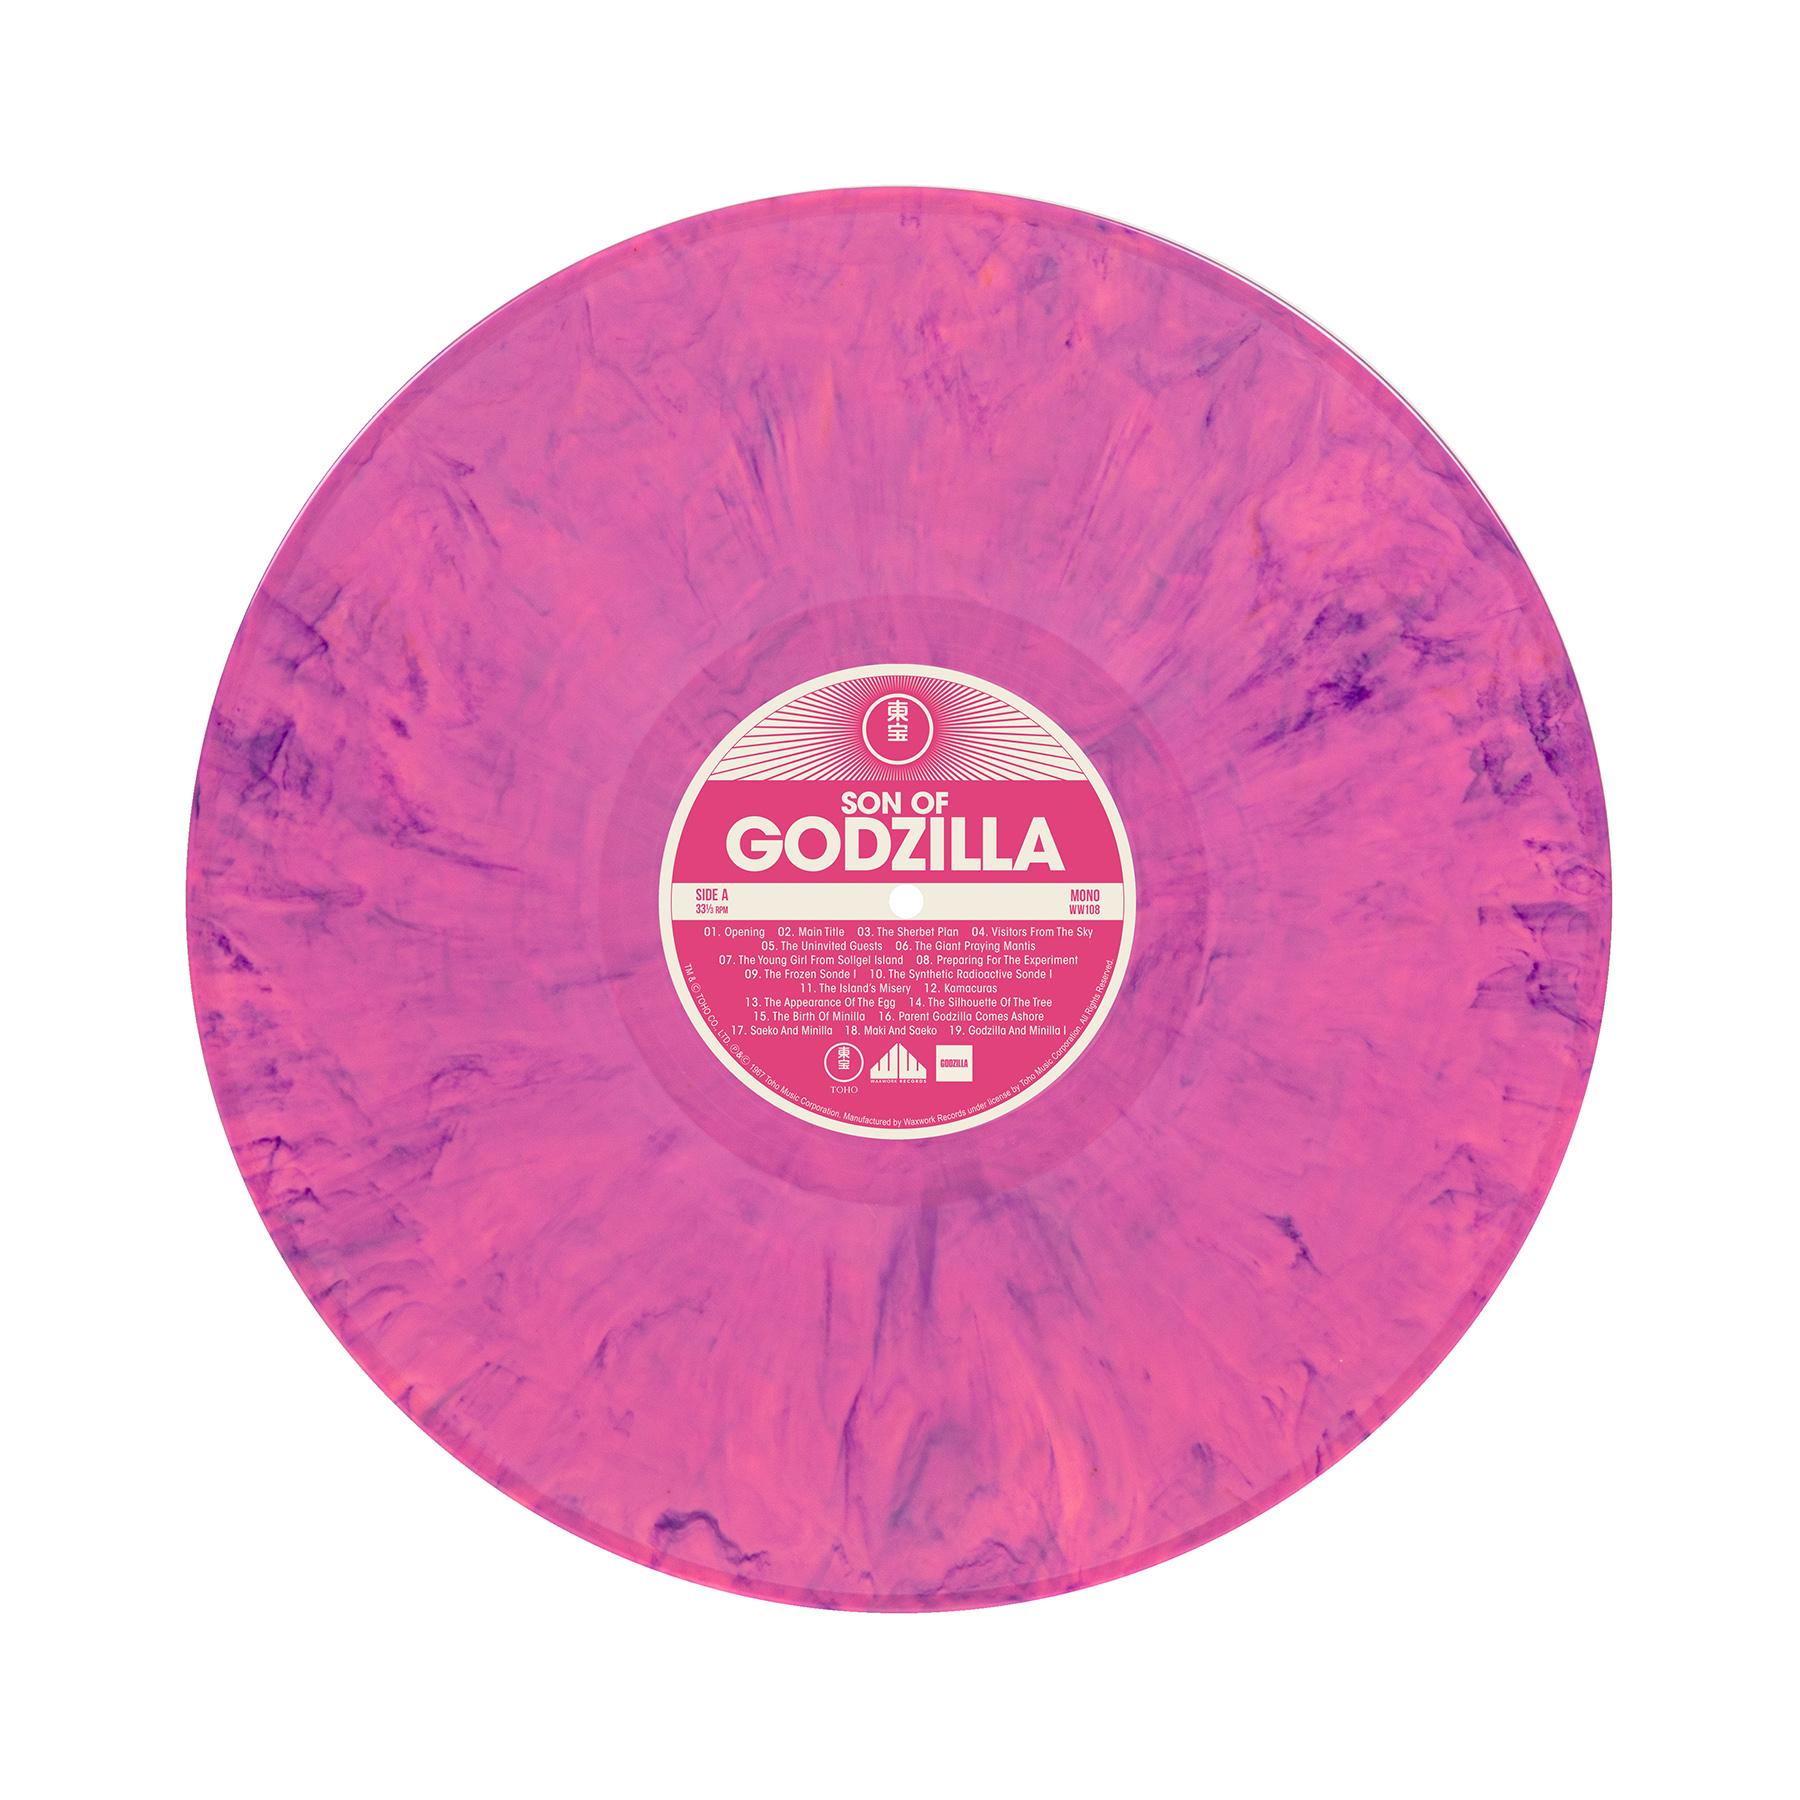 Godzilla: The Showa-Era Soundtracks 1954-1975